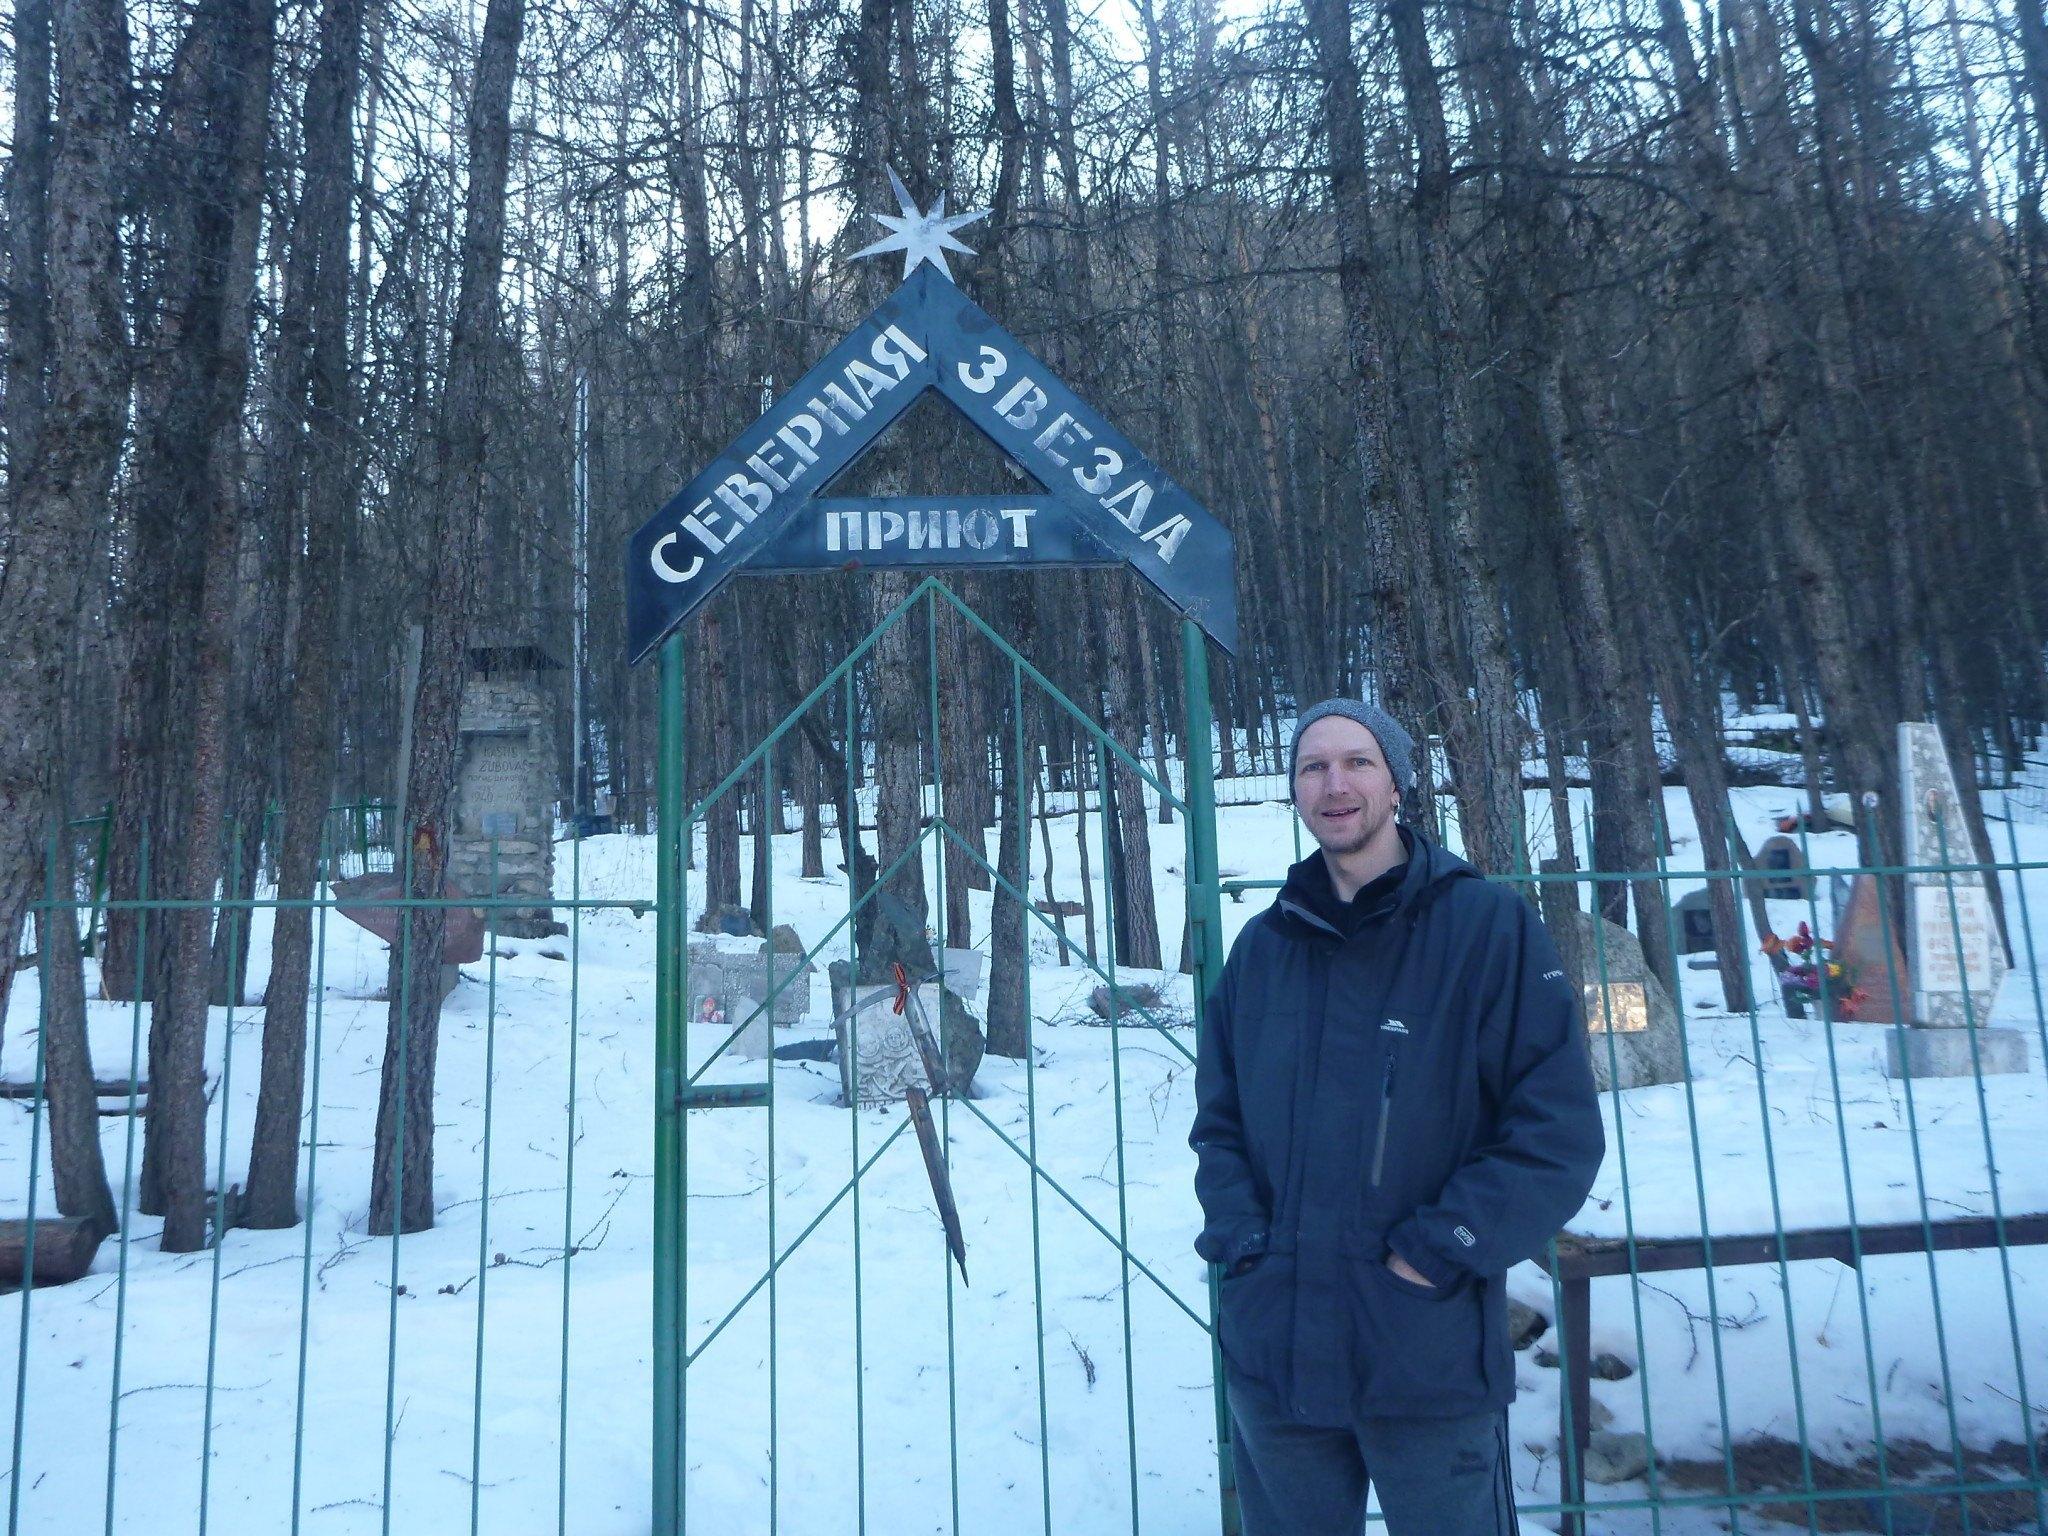 nitw how to break graveyard gate